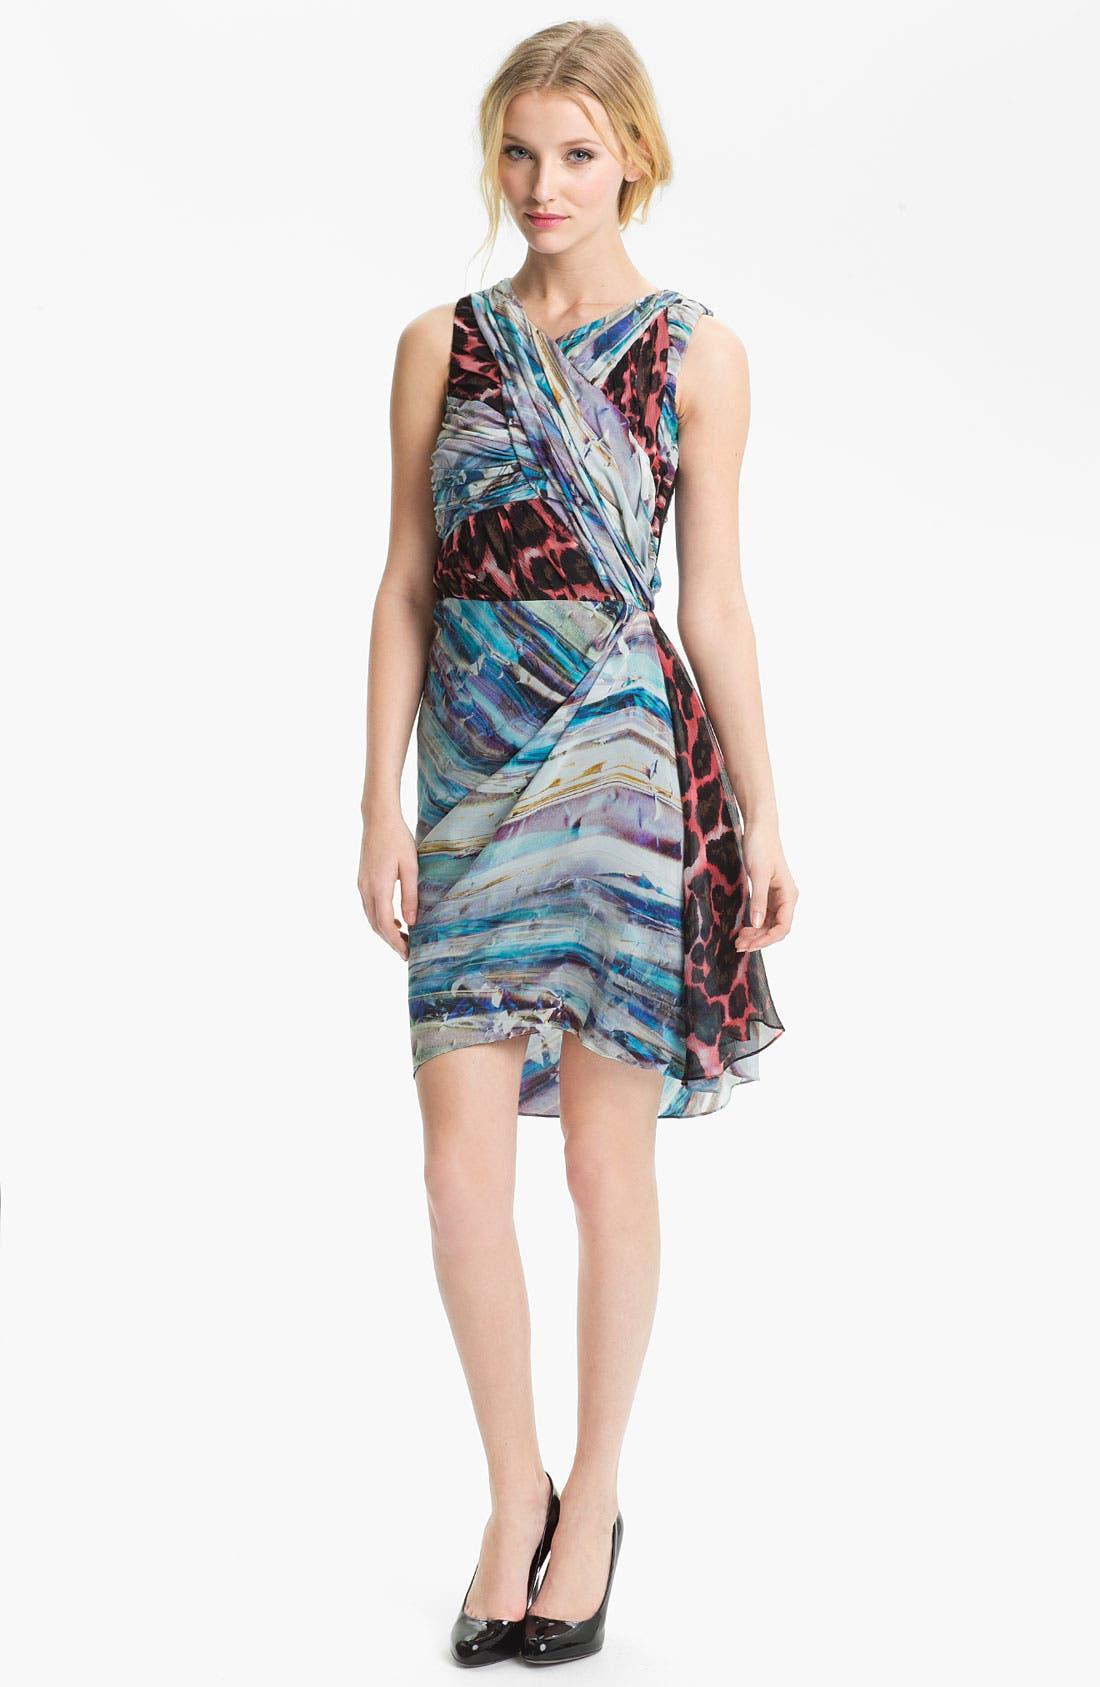 Alternate Image 1 Selected - Rebecca Minkoff 'Gertz' Mix Print Silk Dress